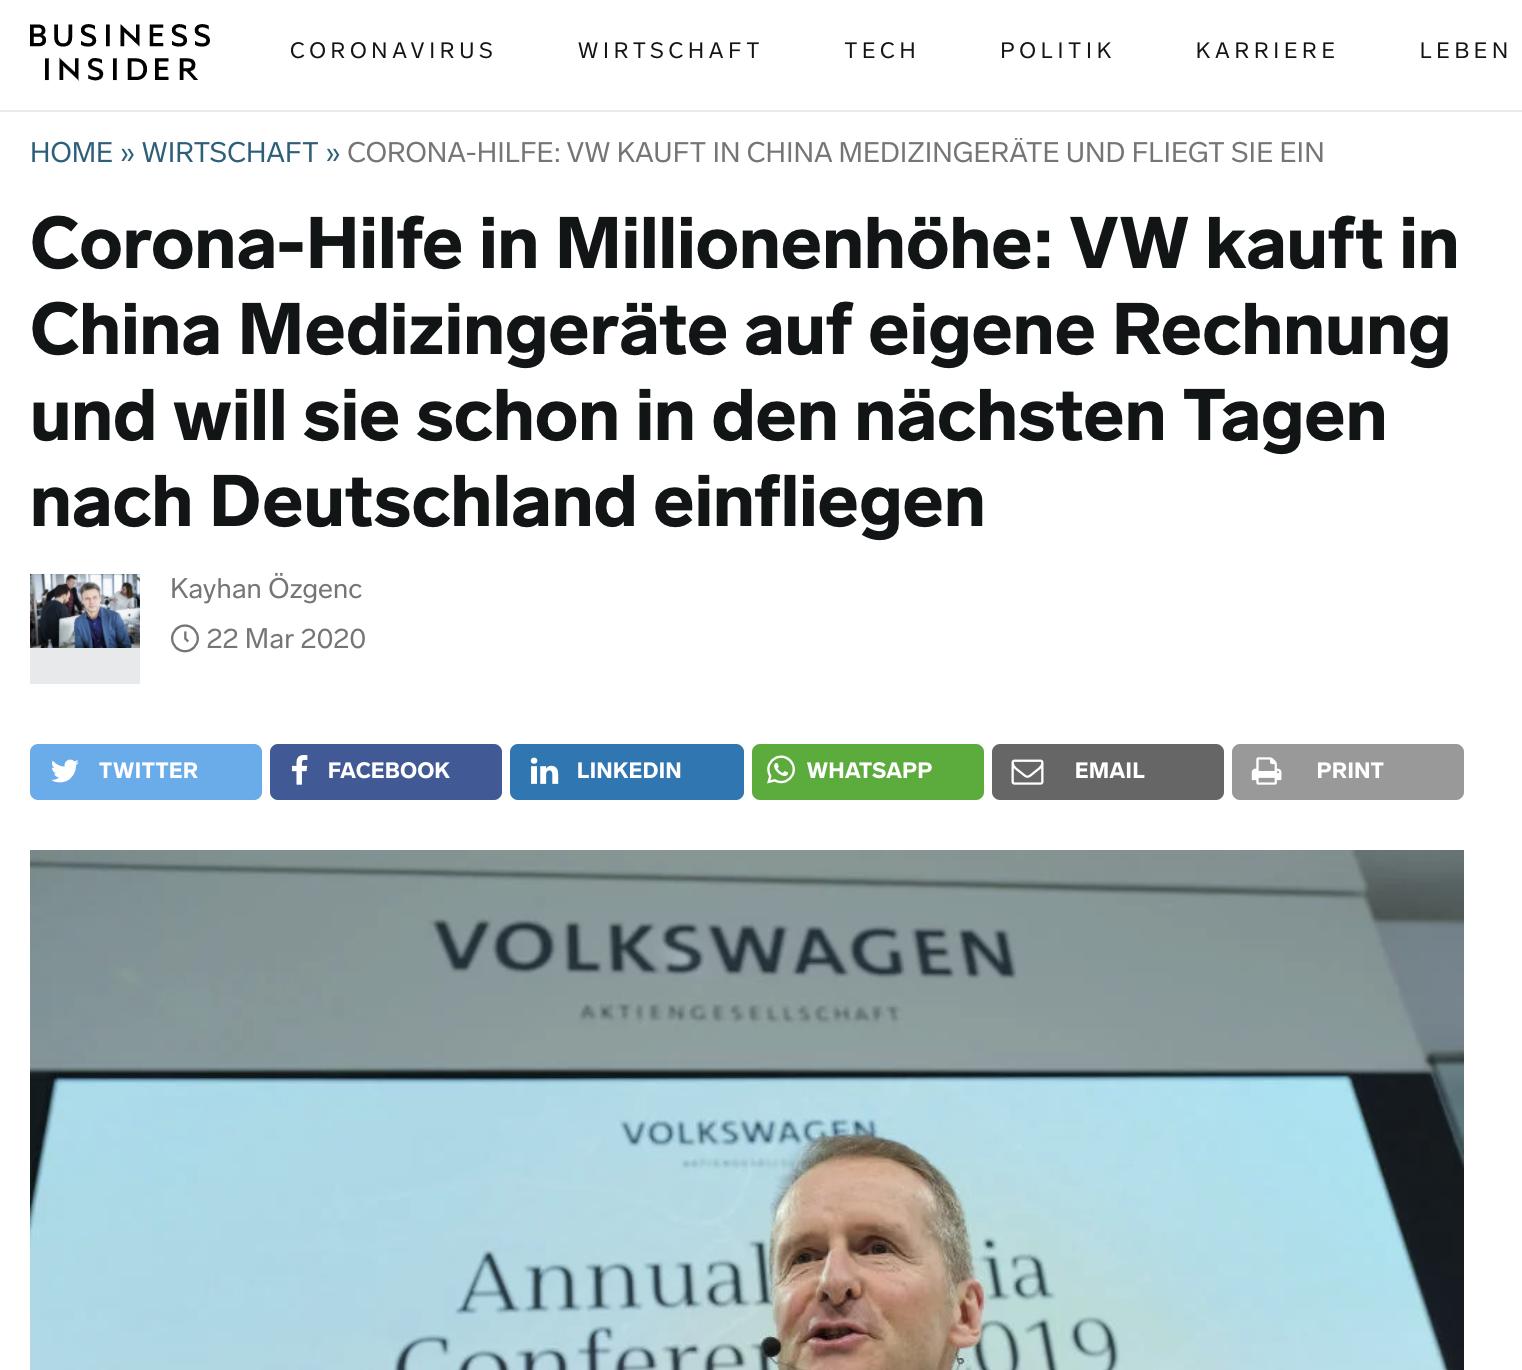 Corona Hilfe: VW kauft in China Medizingeräte